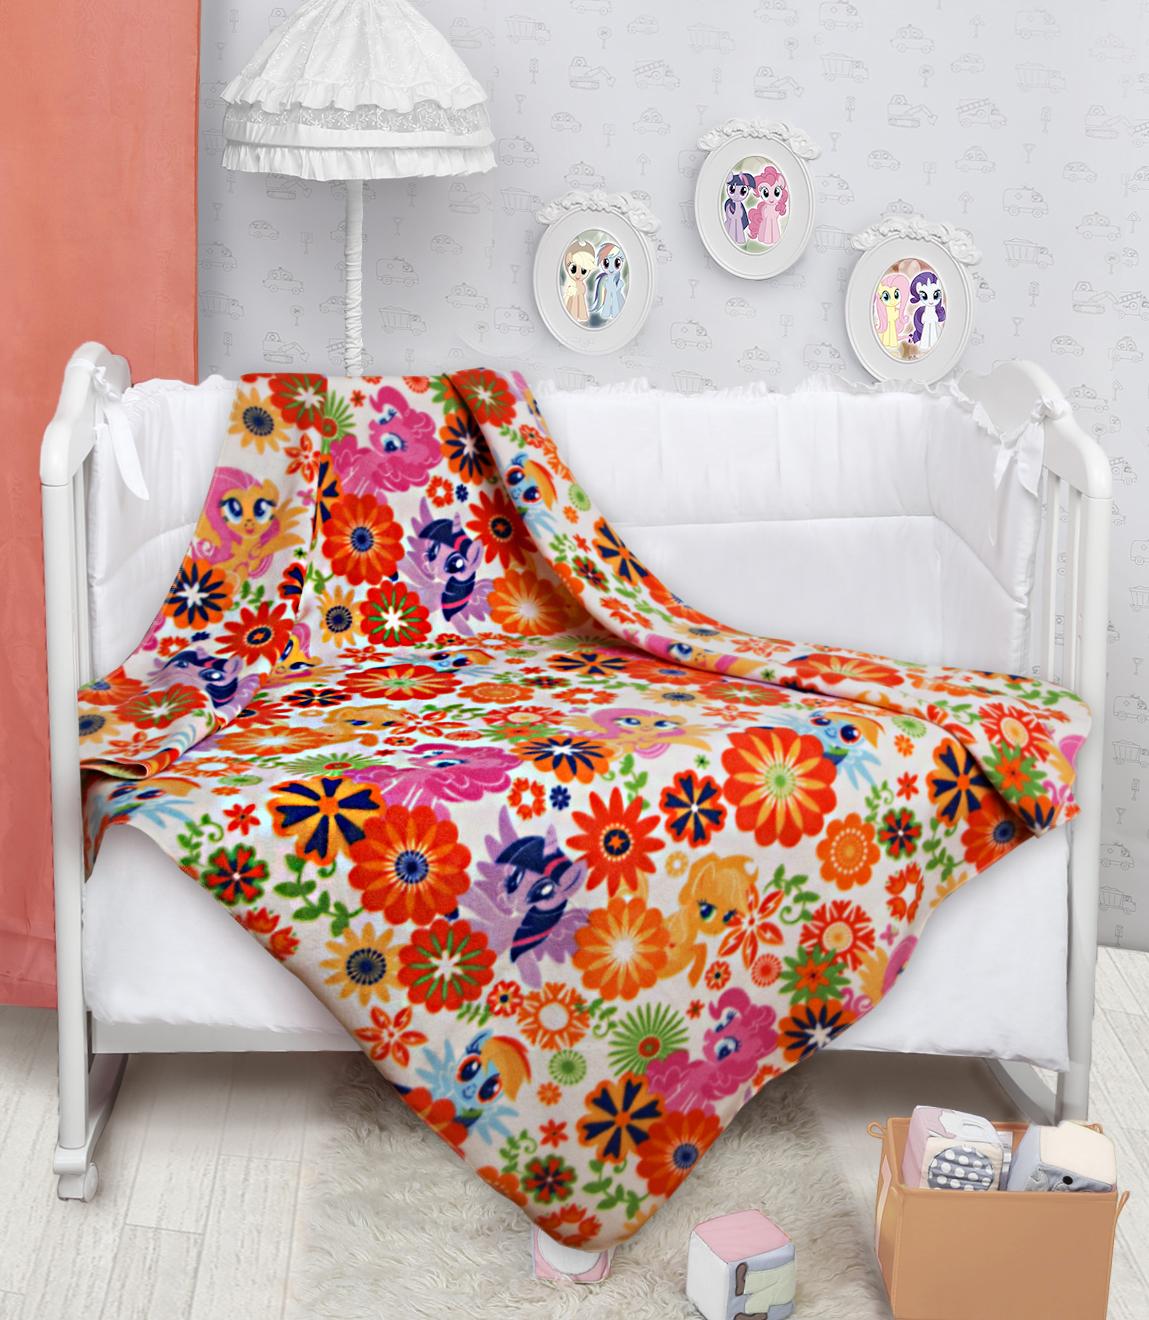 Детские покрывала, подушки, одеяла Mona Liza Детский плед Пони (150х200 см) mona liza mona liza плед флисовый тачки ралли 150х200